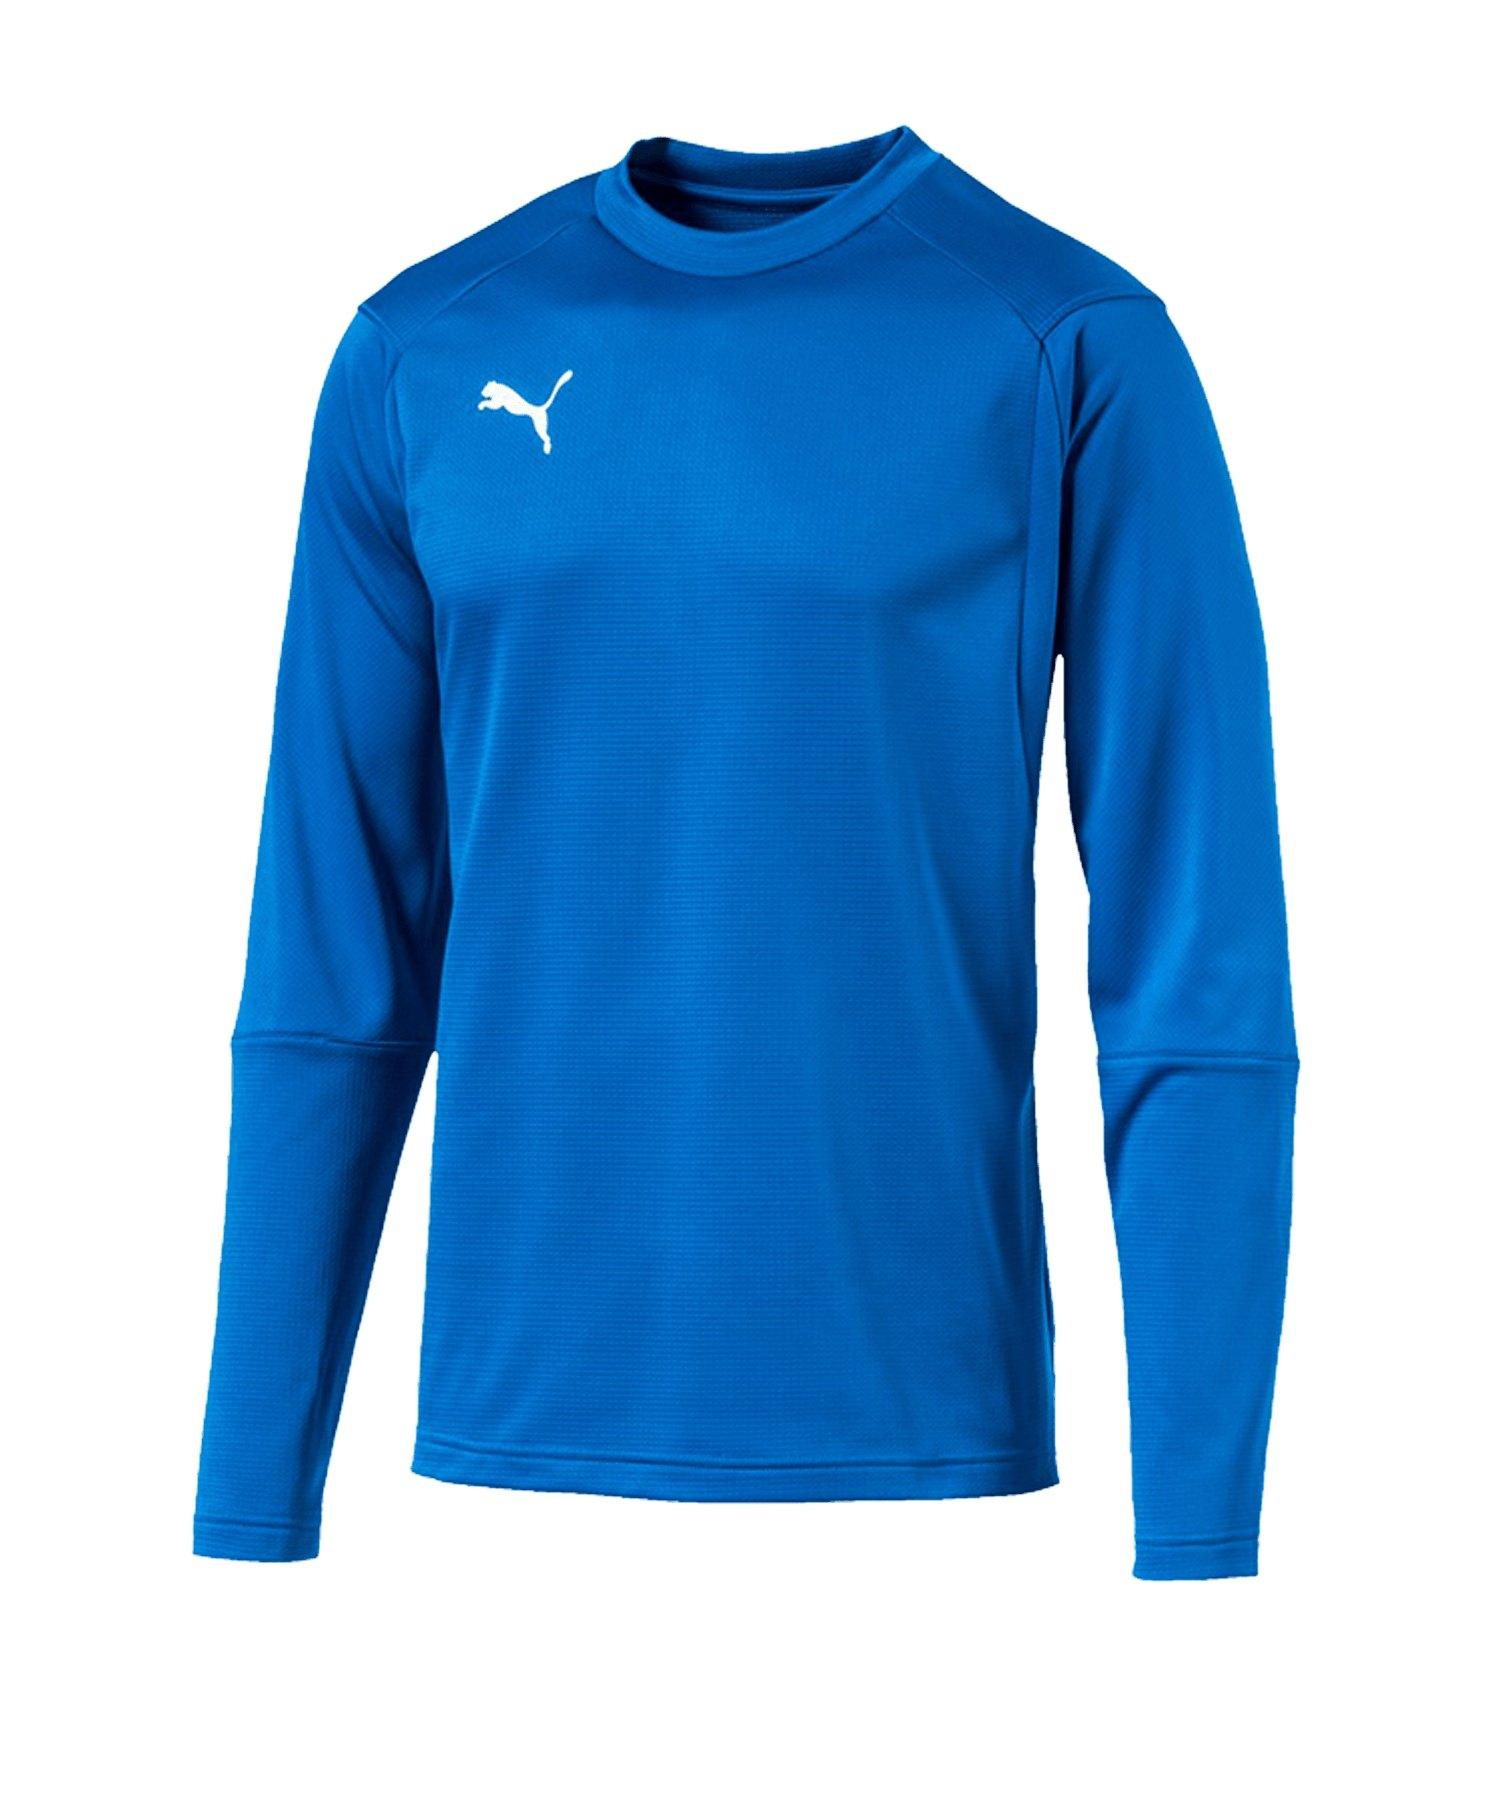 PUMA LIGA Training Sweatshirt Blau F02 - blau